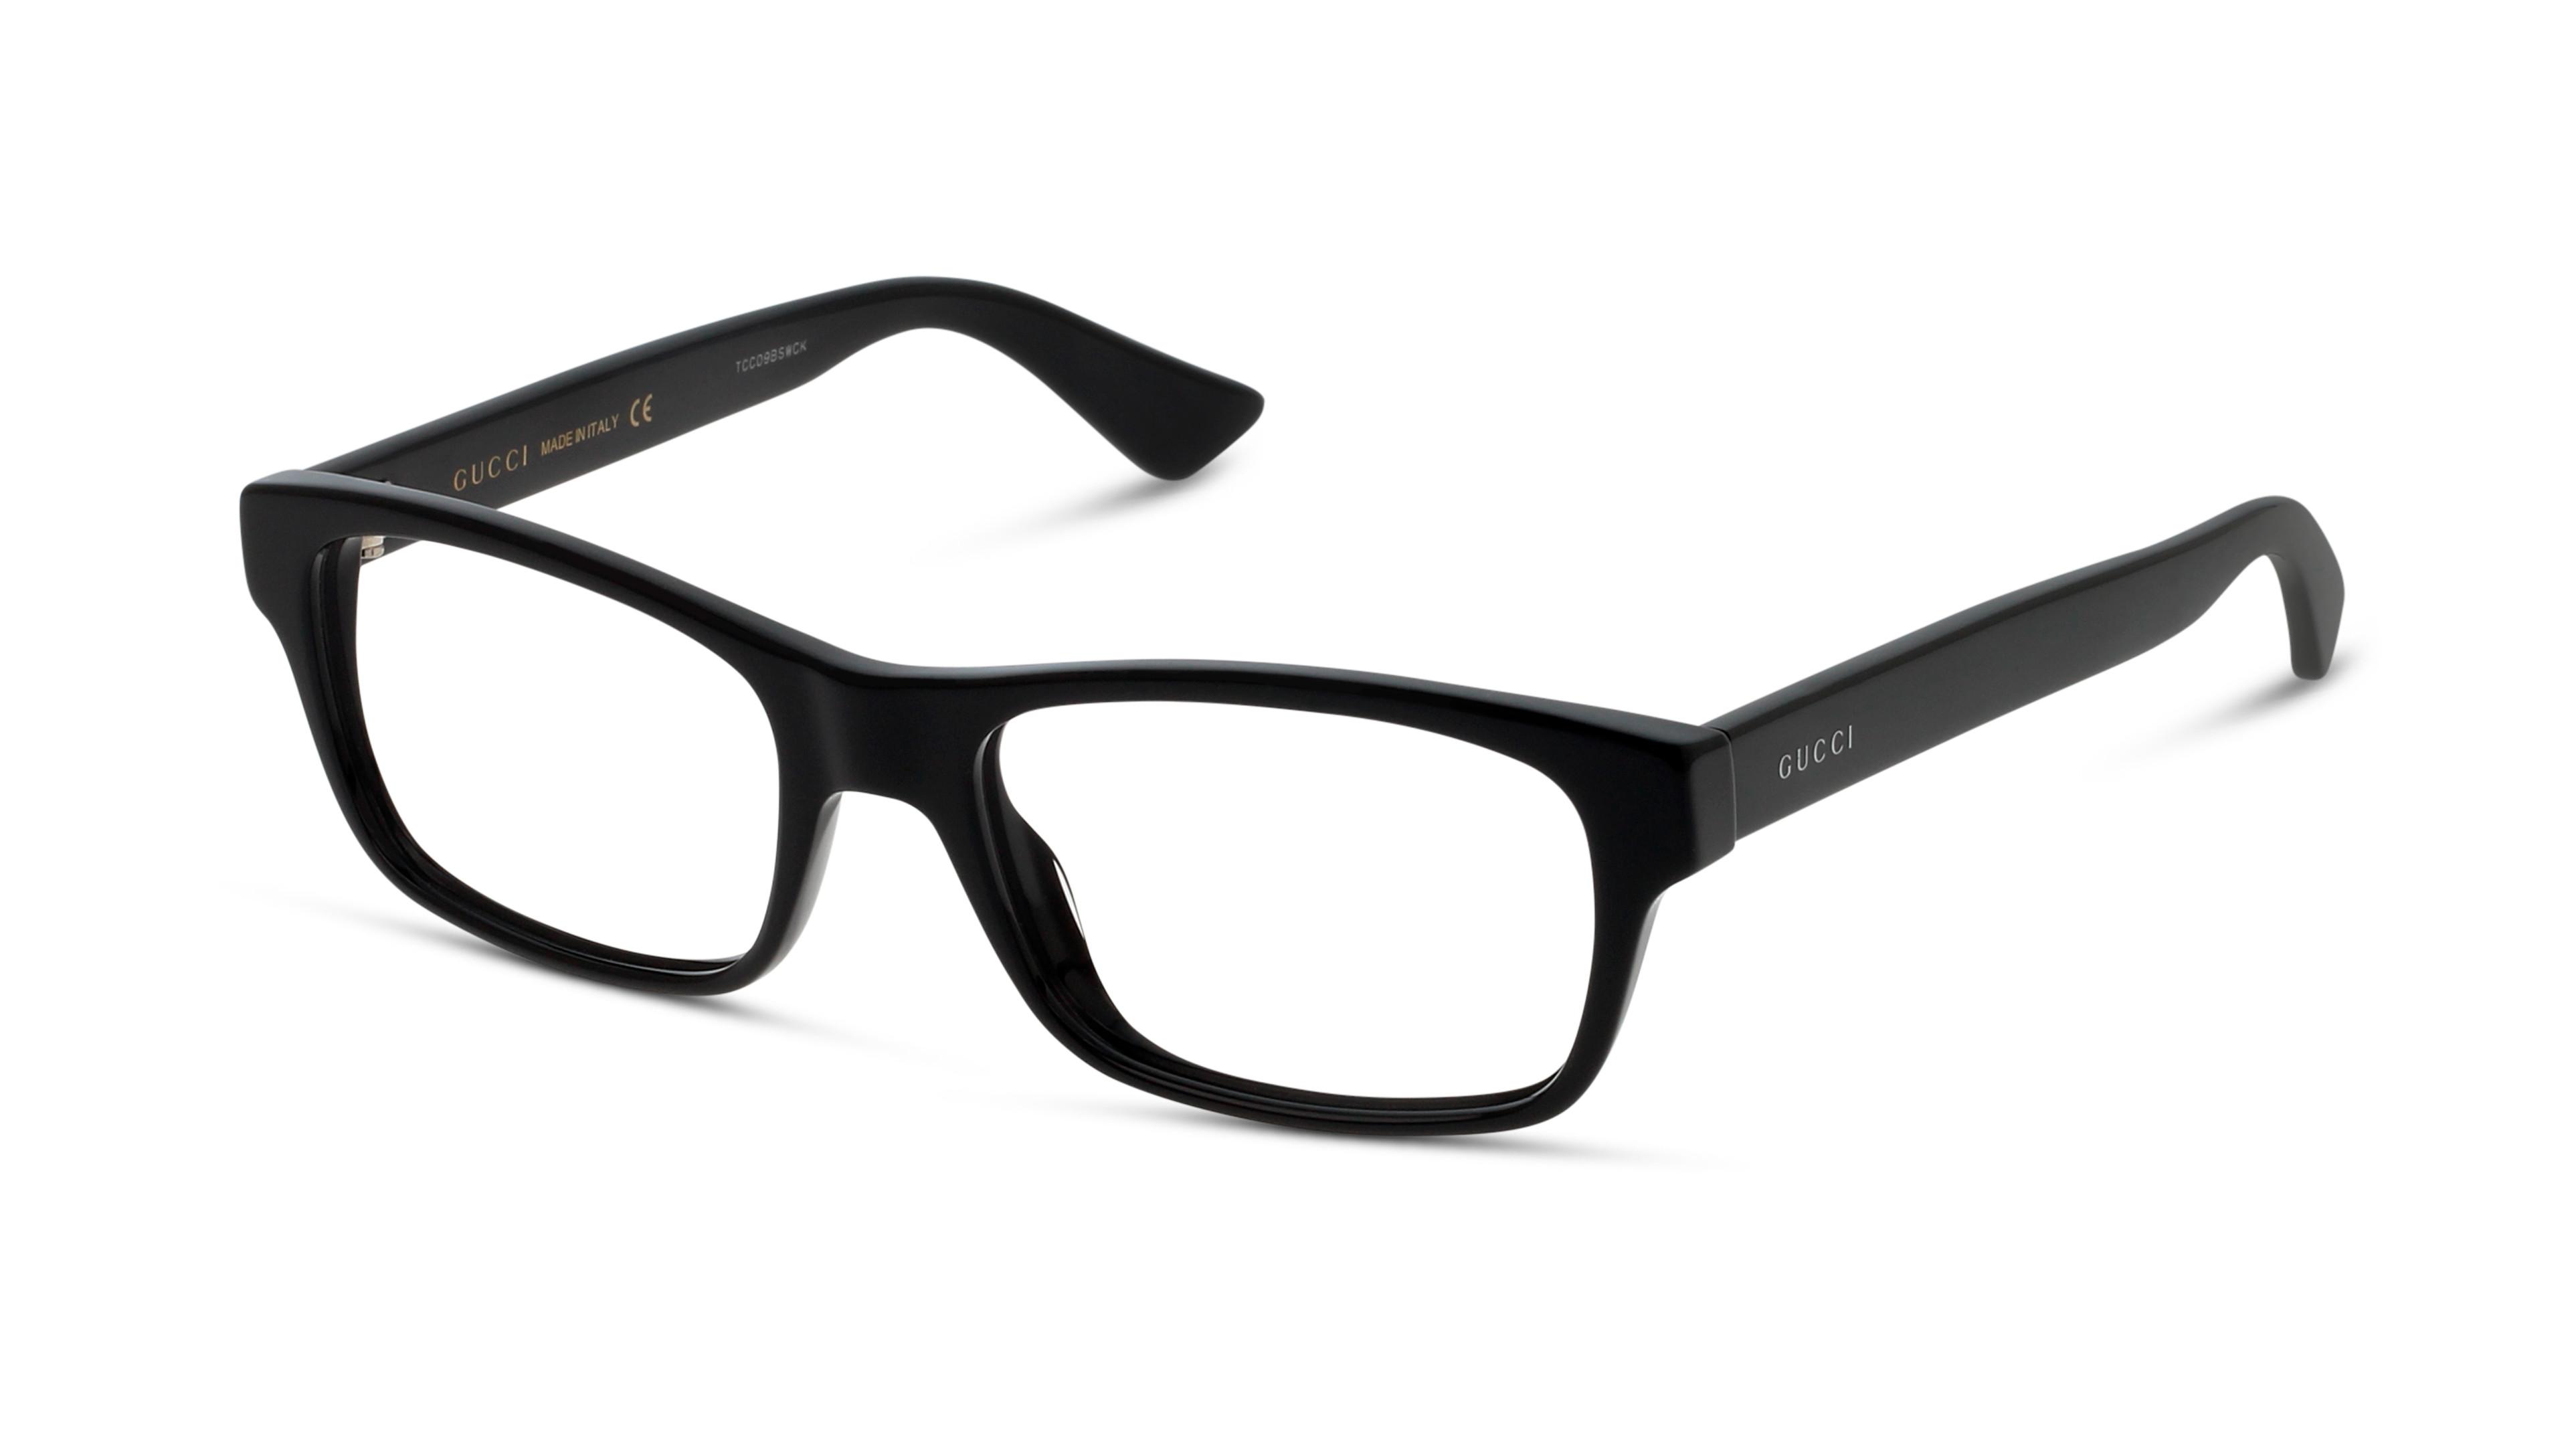 8056376047592-angle-gucci-brillenfassung-0006o-eyewear-black-black-transparent